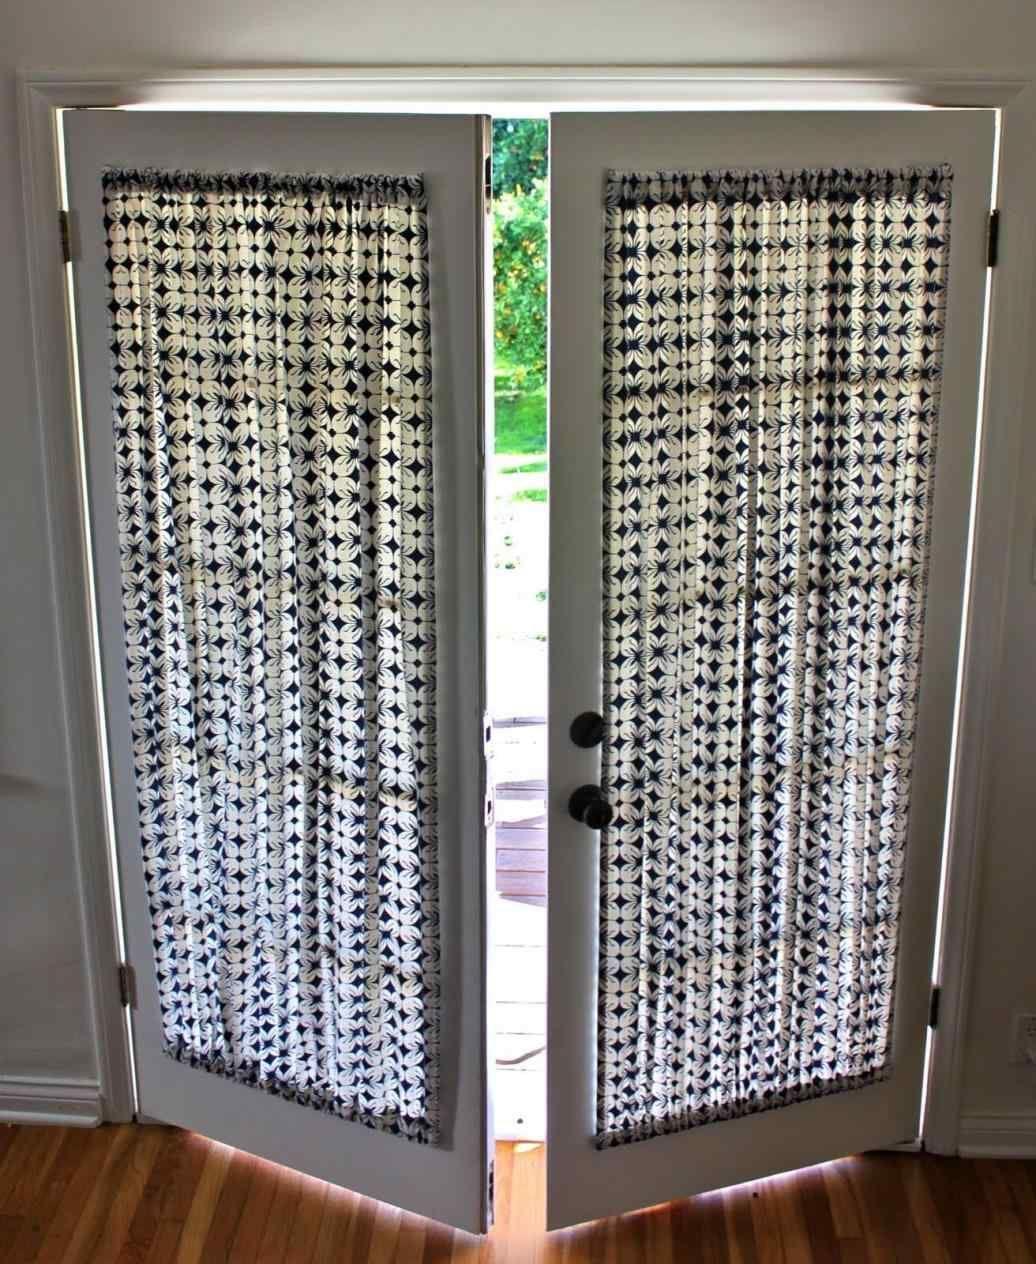 14 Diy Panel Blinds Ideas Diy Project French Door Curtains Door Panel Curtains French Door Curtain Panels